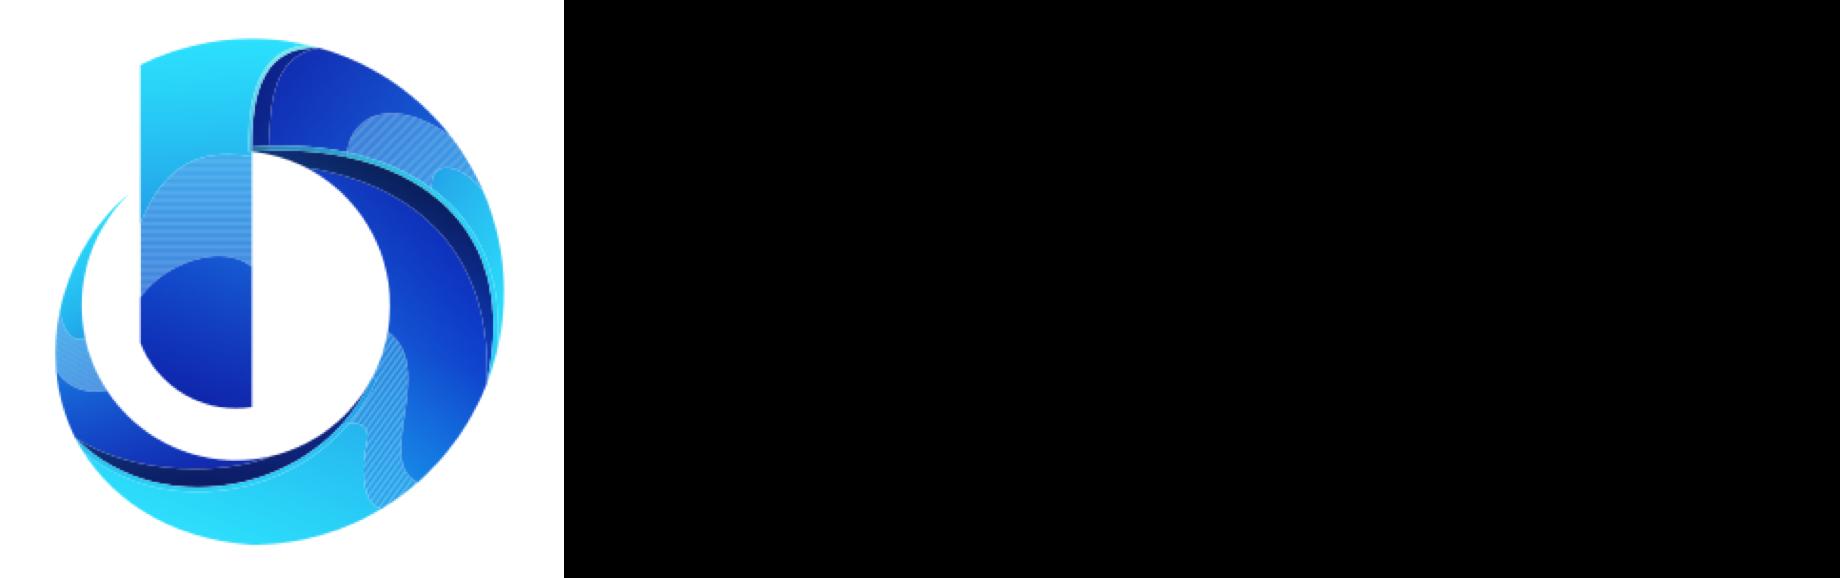 D-debtriever-logo